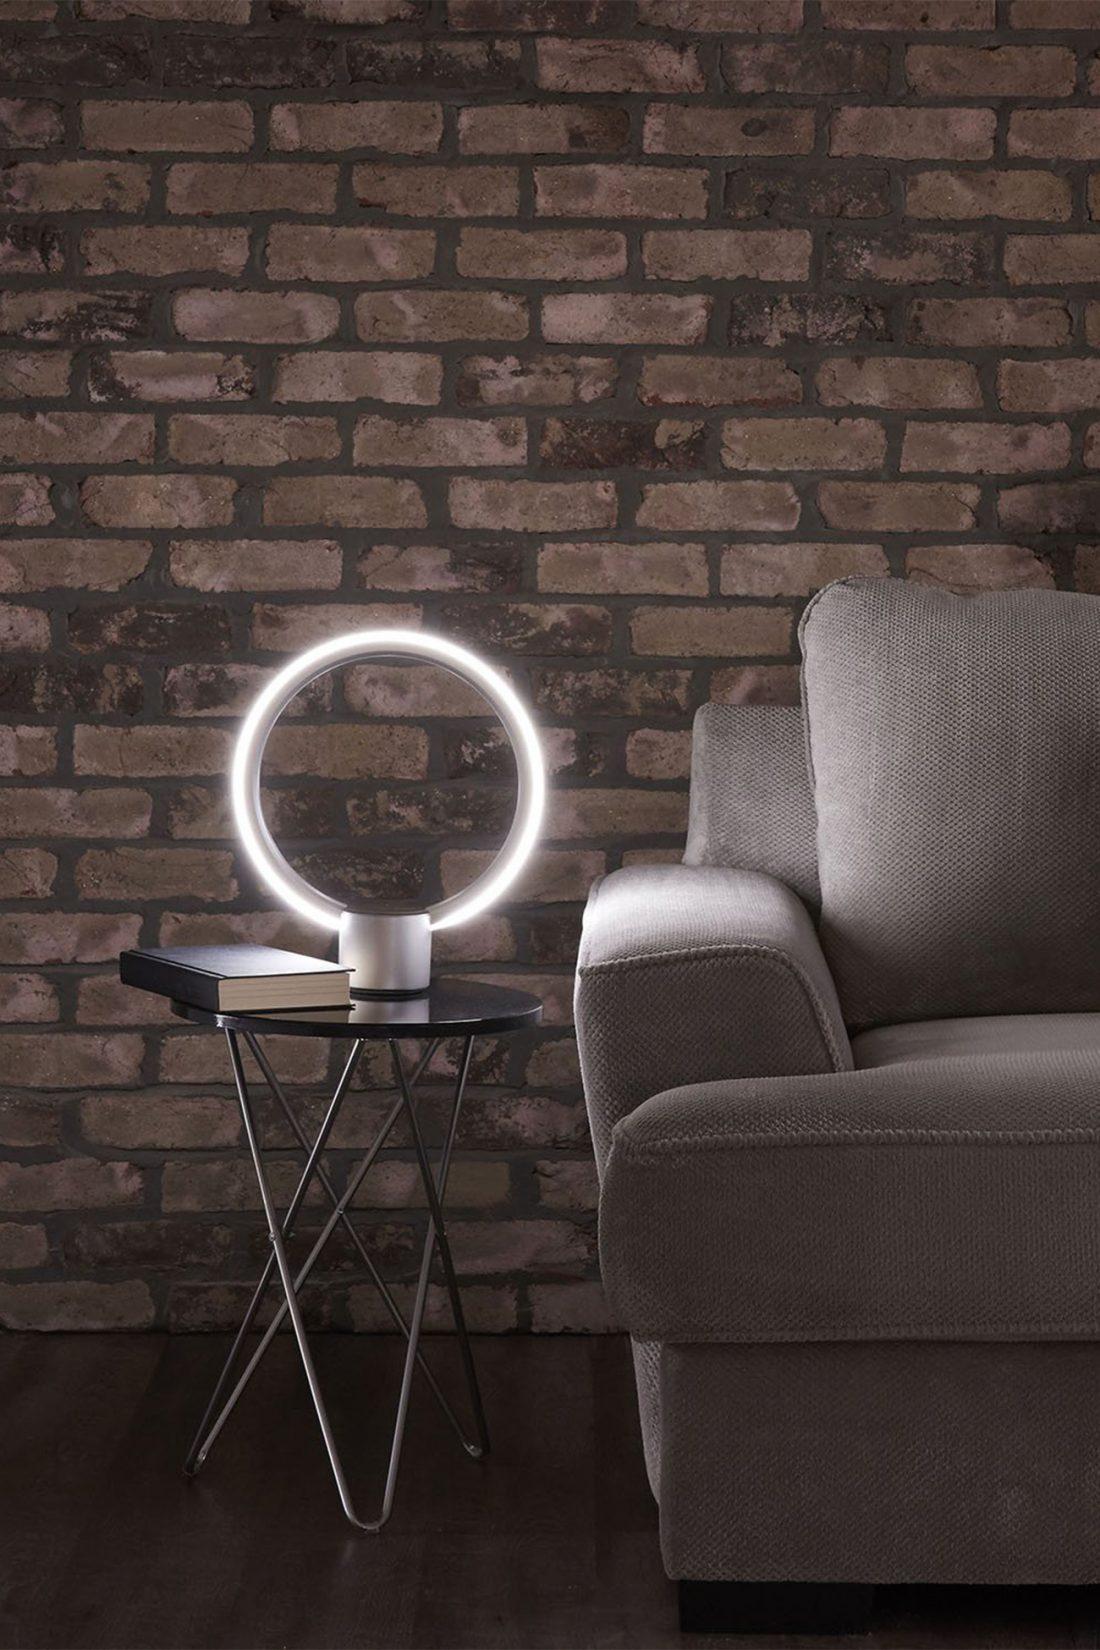 Sol by GE: Smart lighting